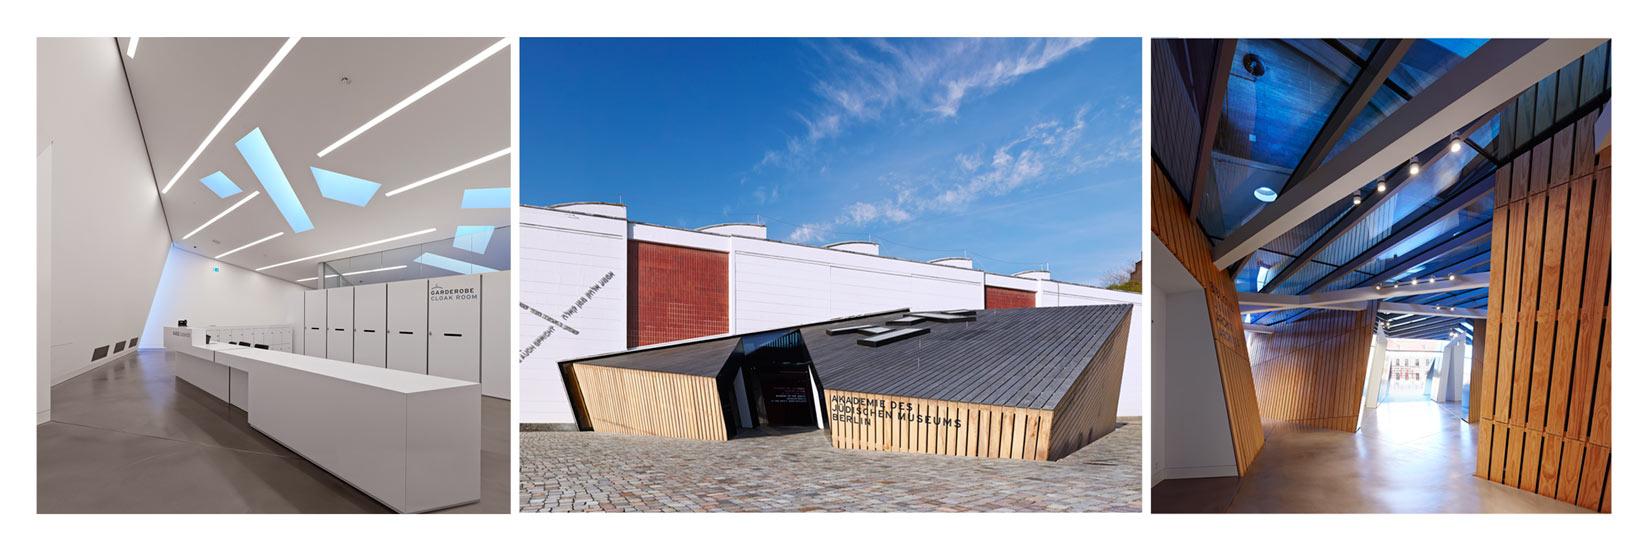 Industriefotograf-Architektur-Fotograf-Berlin-Falkensee